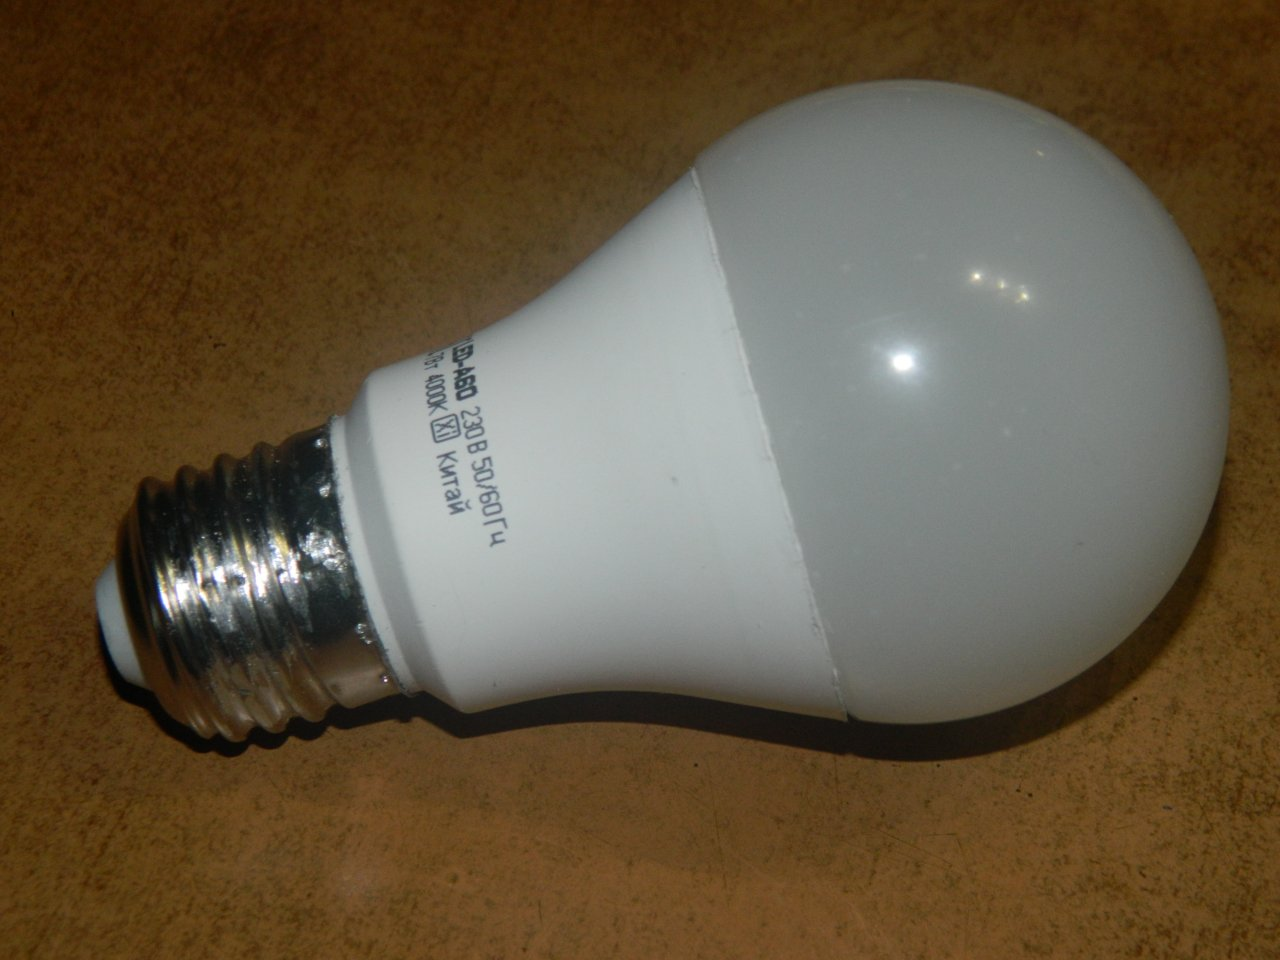 Светодиодная лампа типа «кукуруза» на основе энергосберегайки